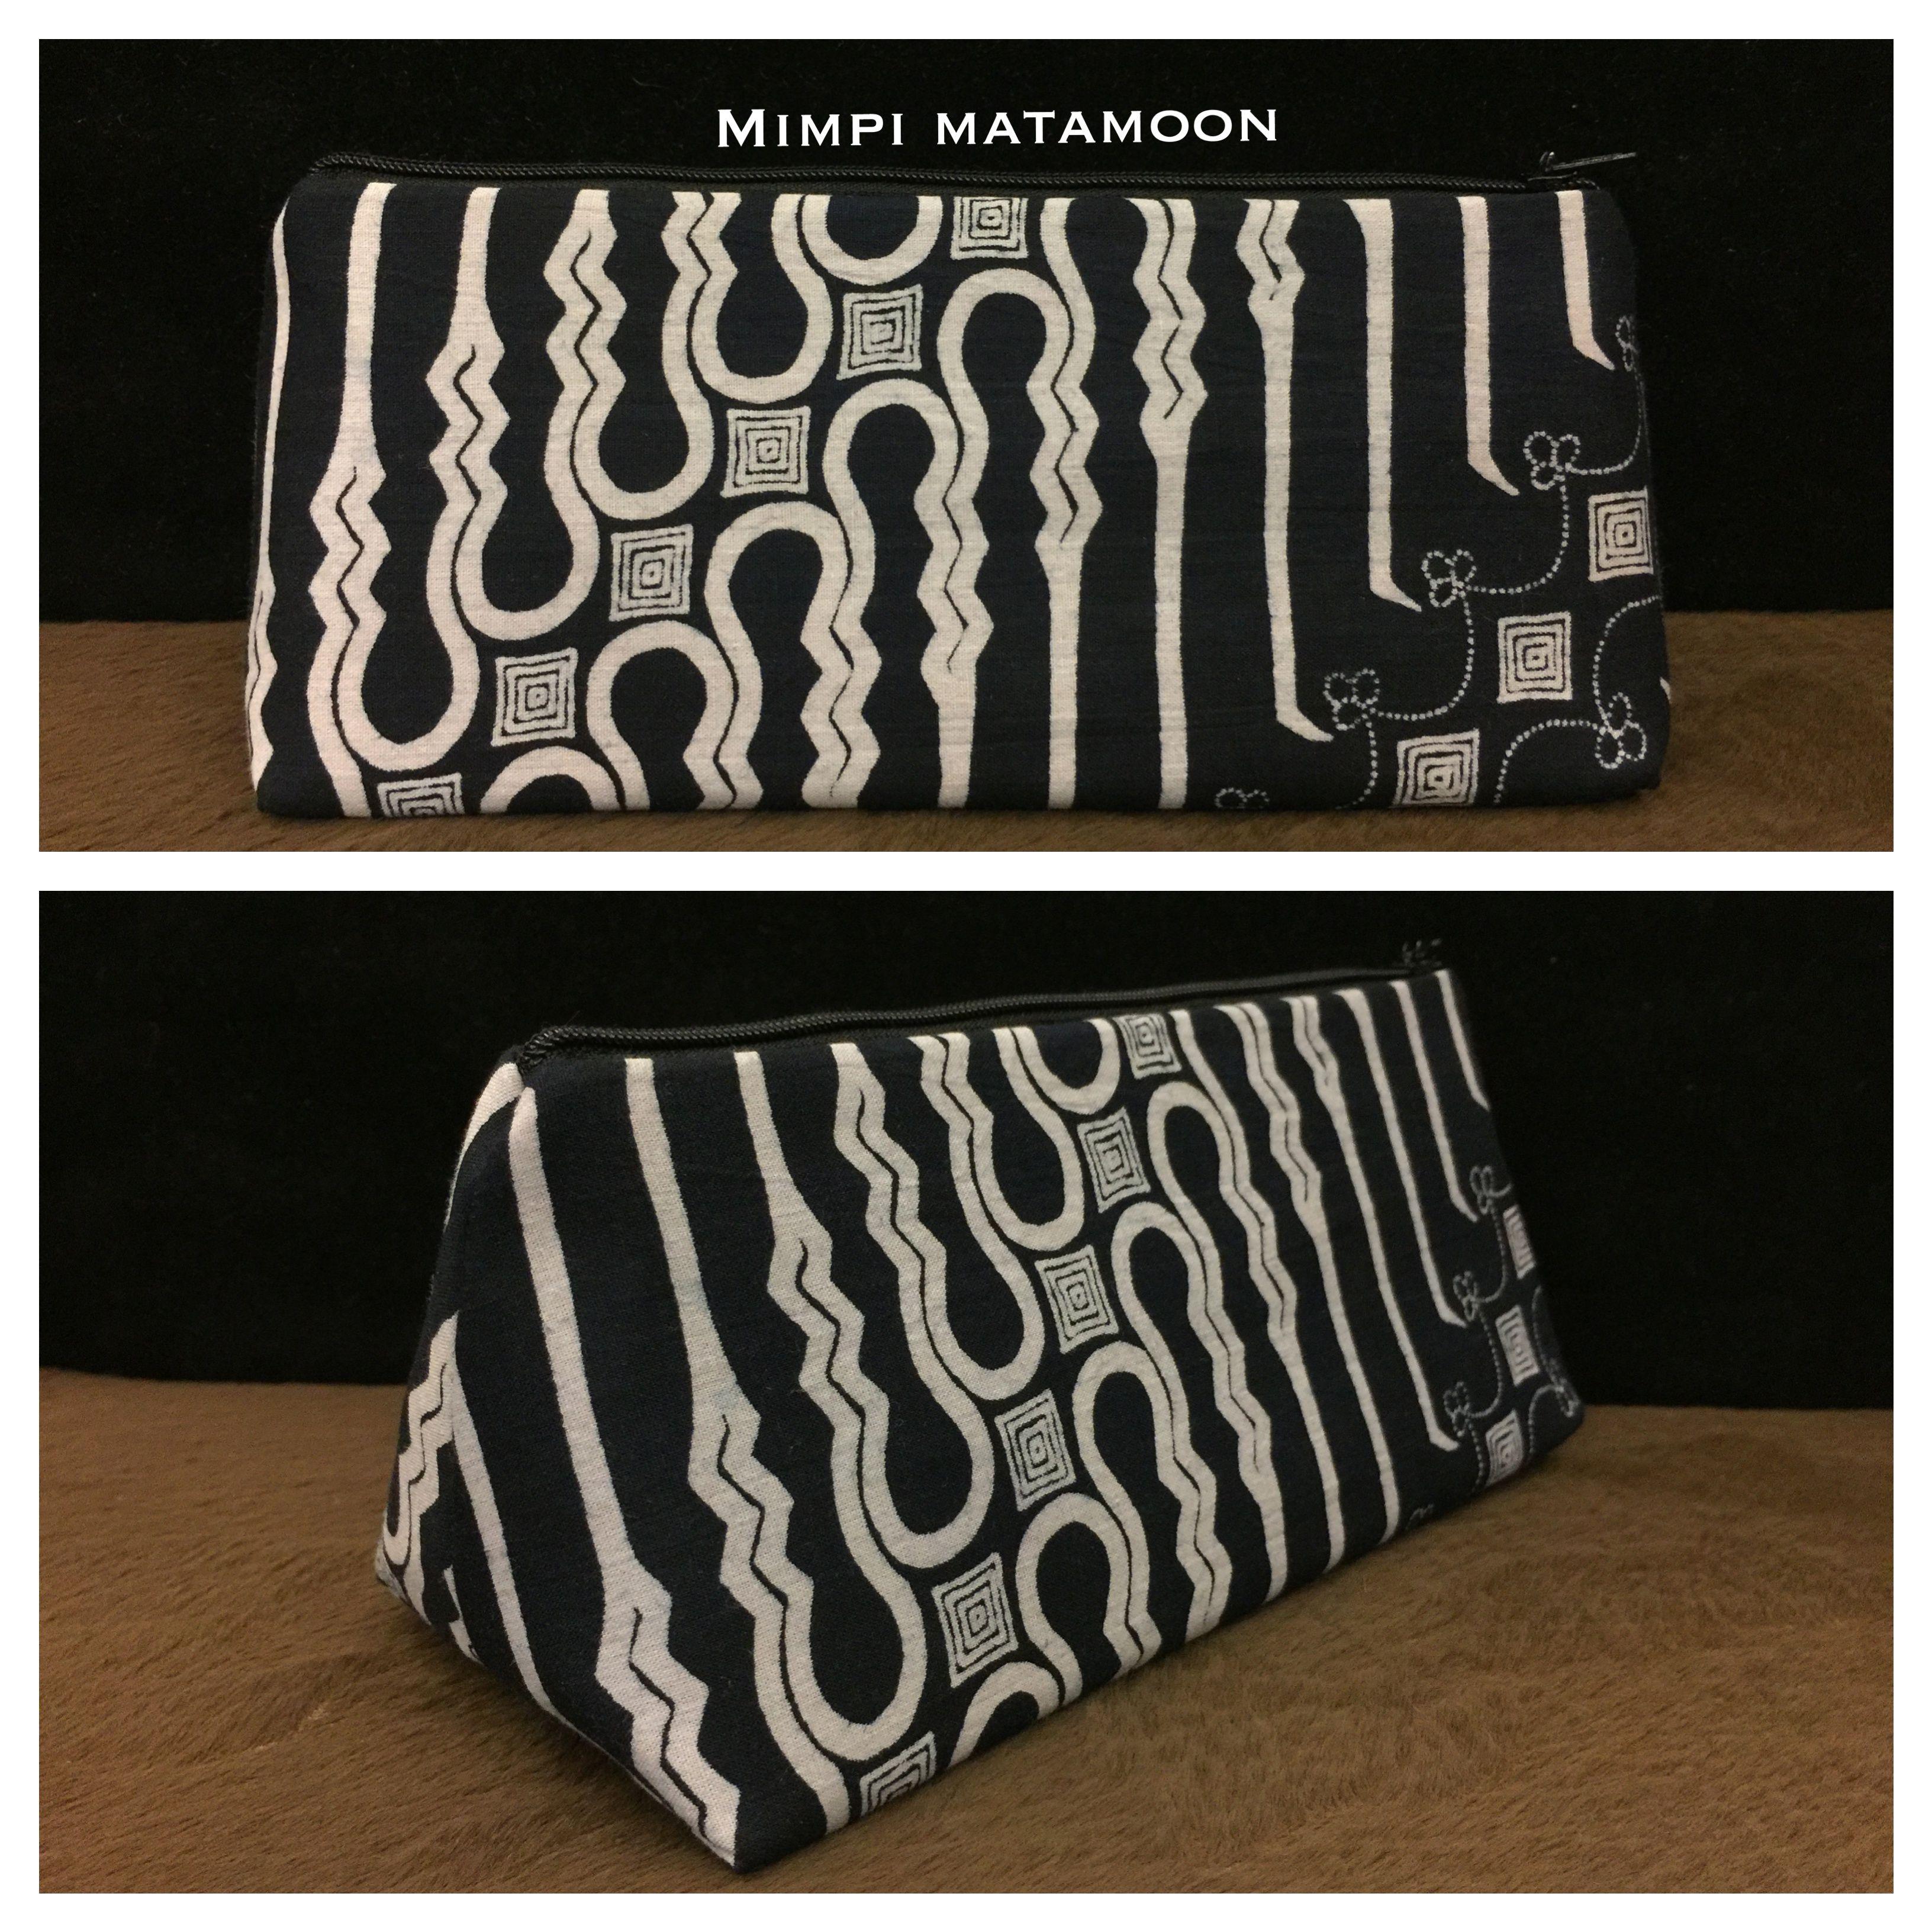 2118TMIBTK Black&White Batik Nusantara #mimpimatamoon